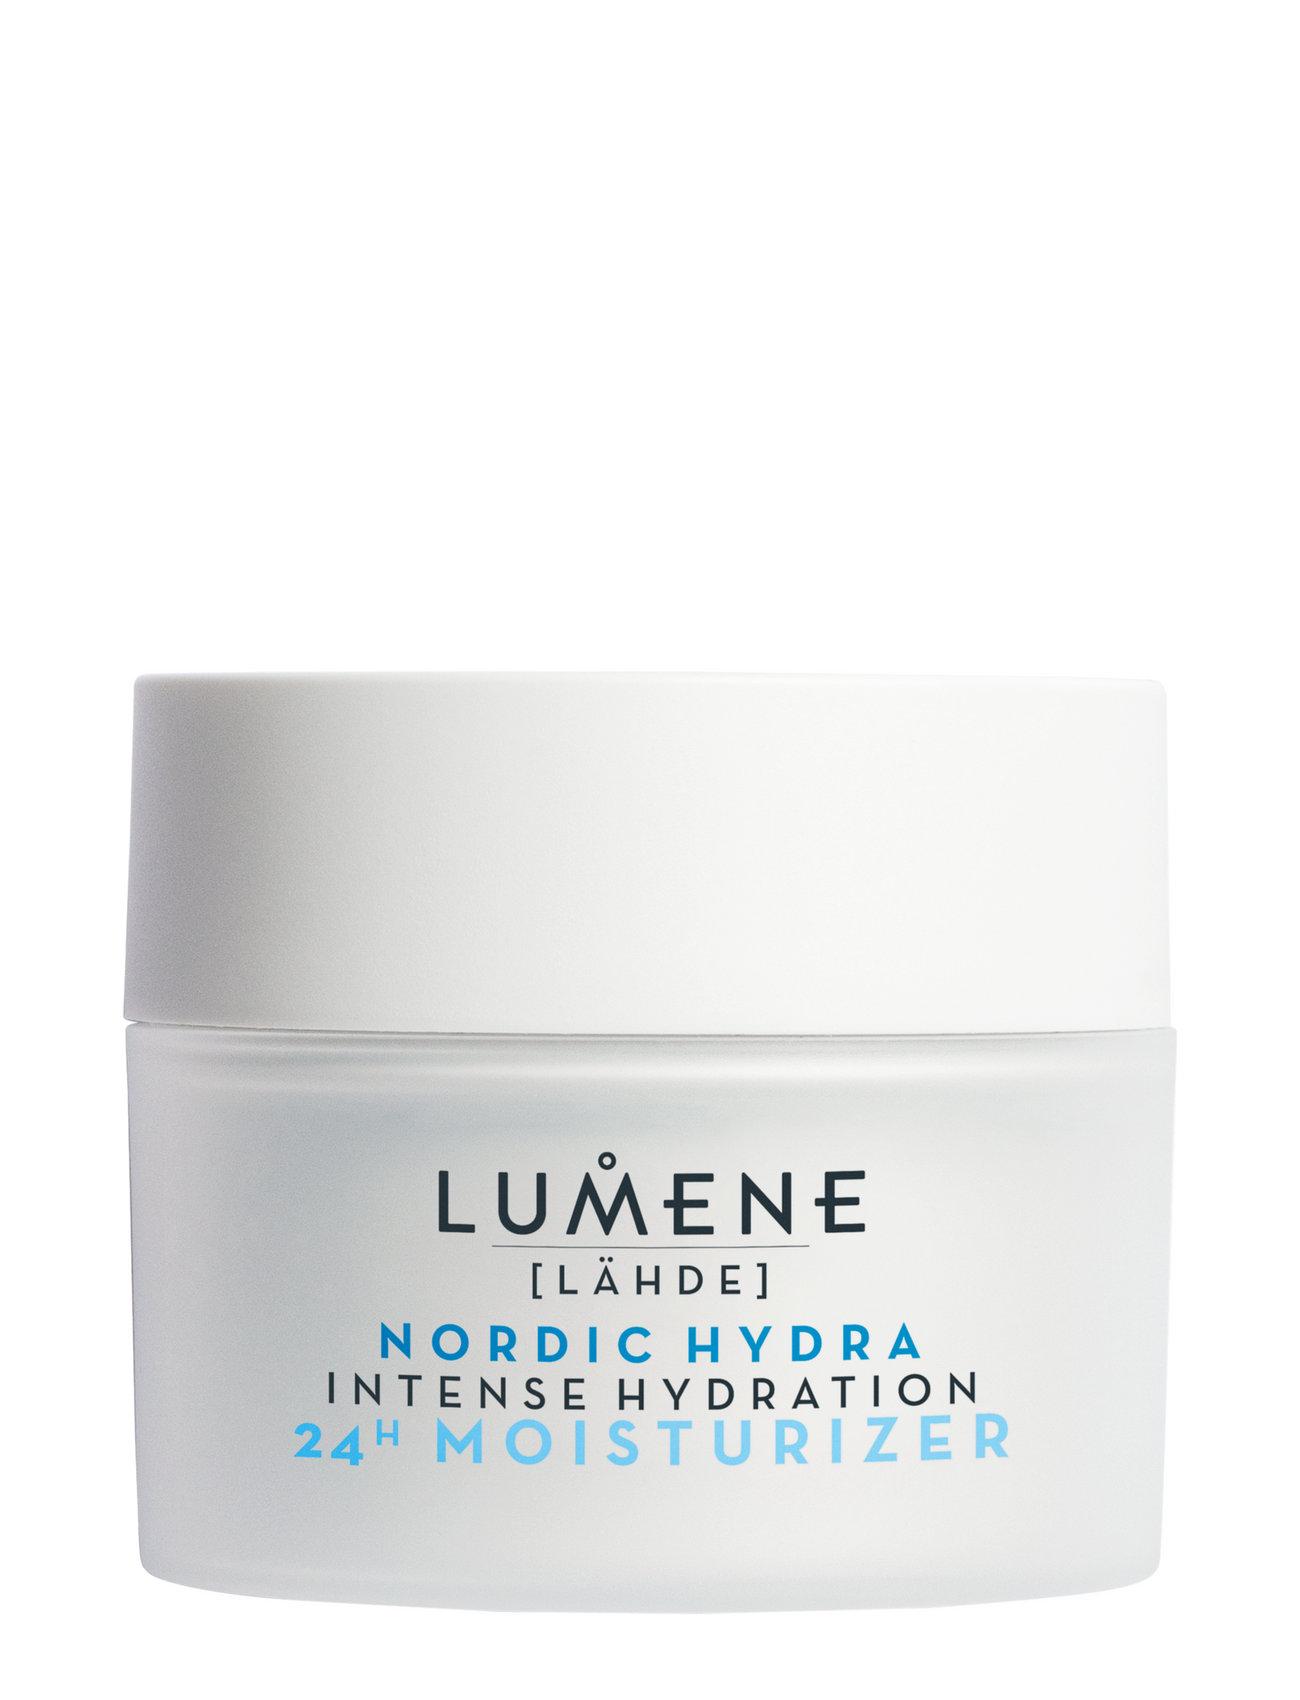 Image of LäHde Nordic Hydra Intense Hydration 24h Moisturizer Beauty WOMEN Skin Care Face Day Creams Nude LUMENE (3346815837)